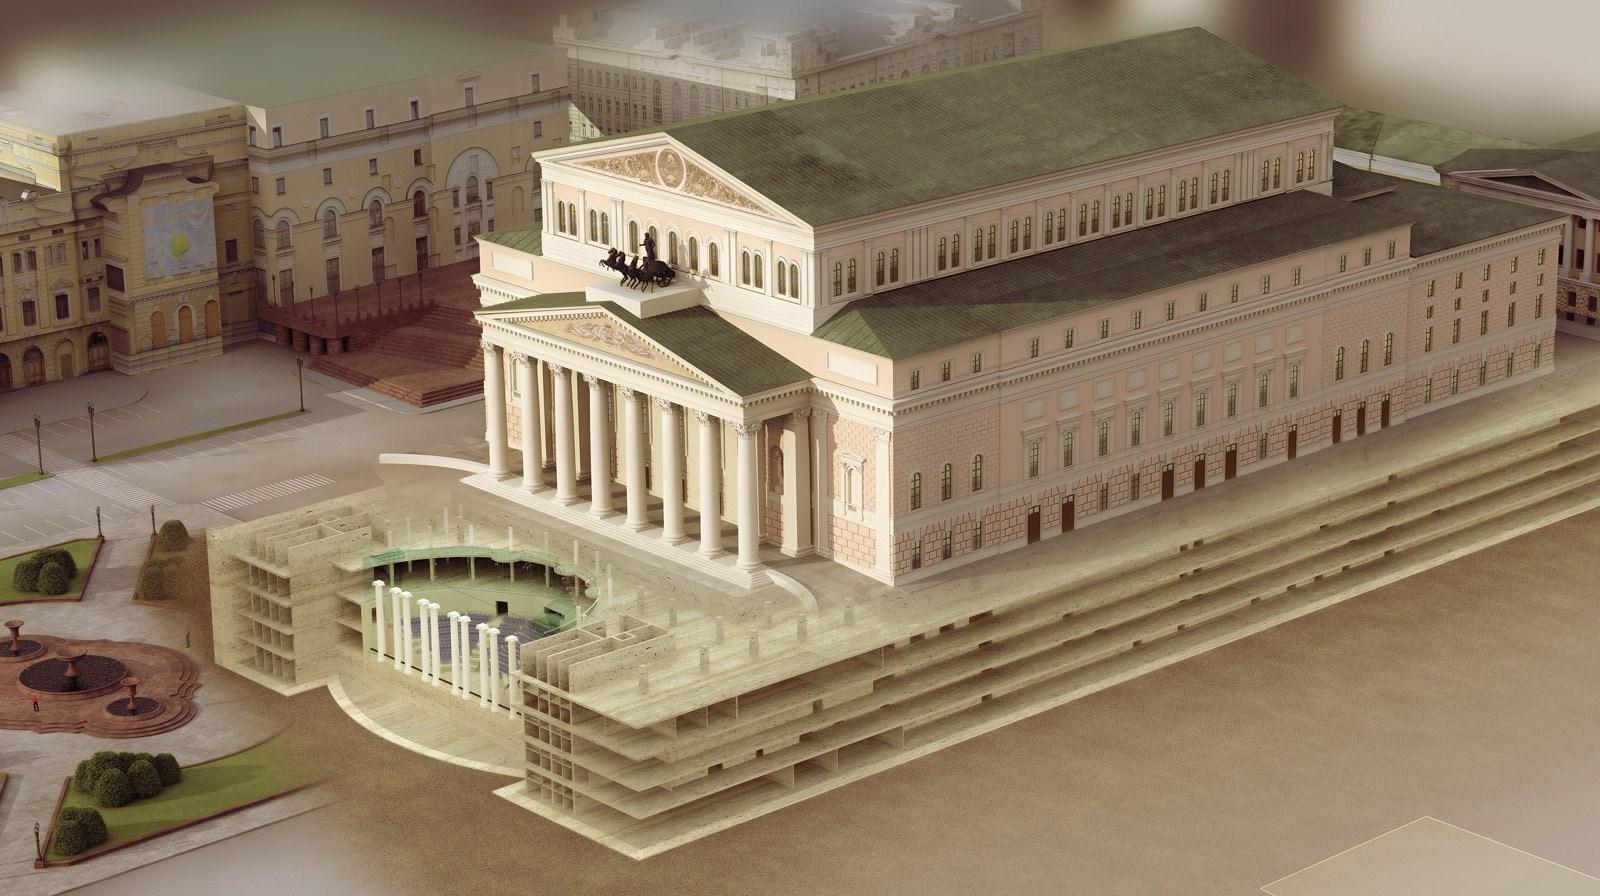 ... Theatre of Russia 3D Front Elevatin Design & Russia House Design